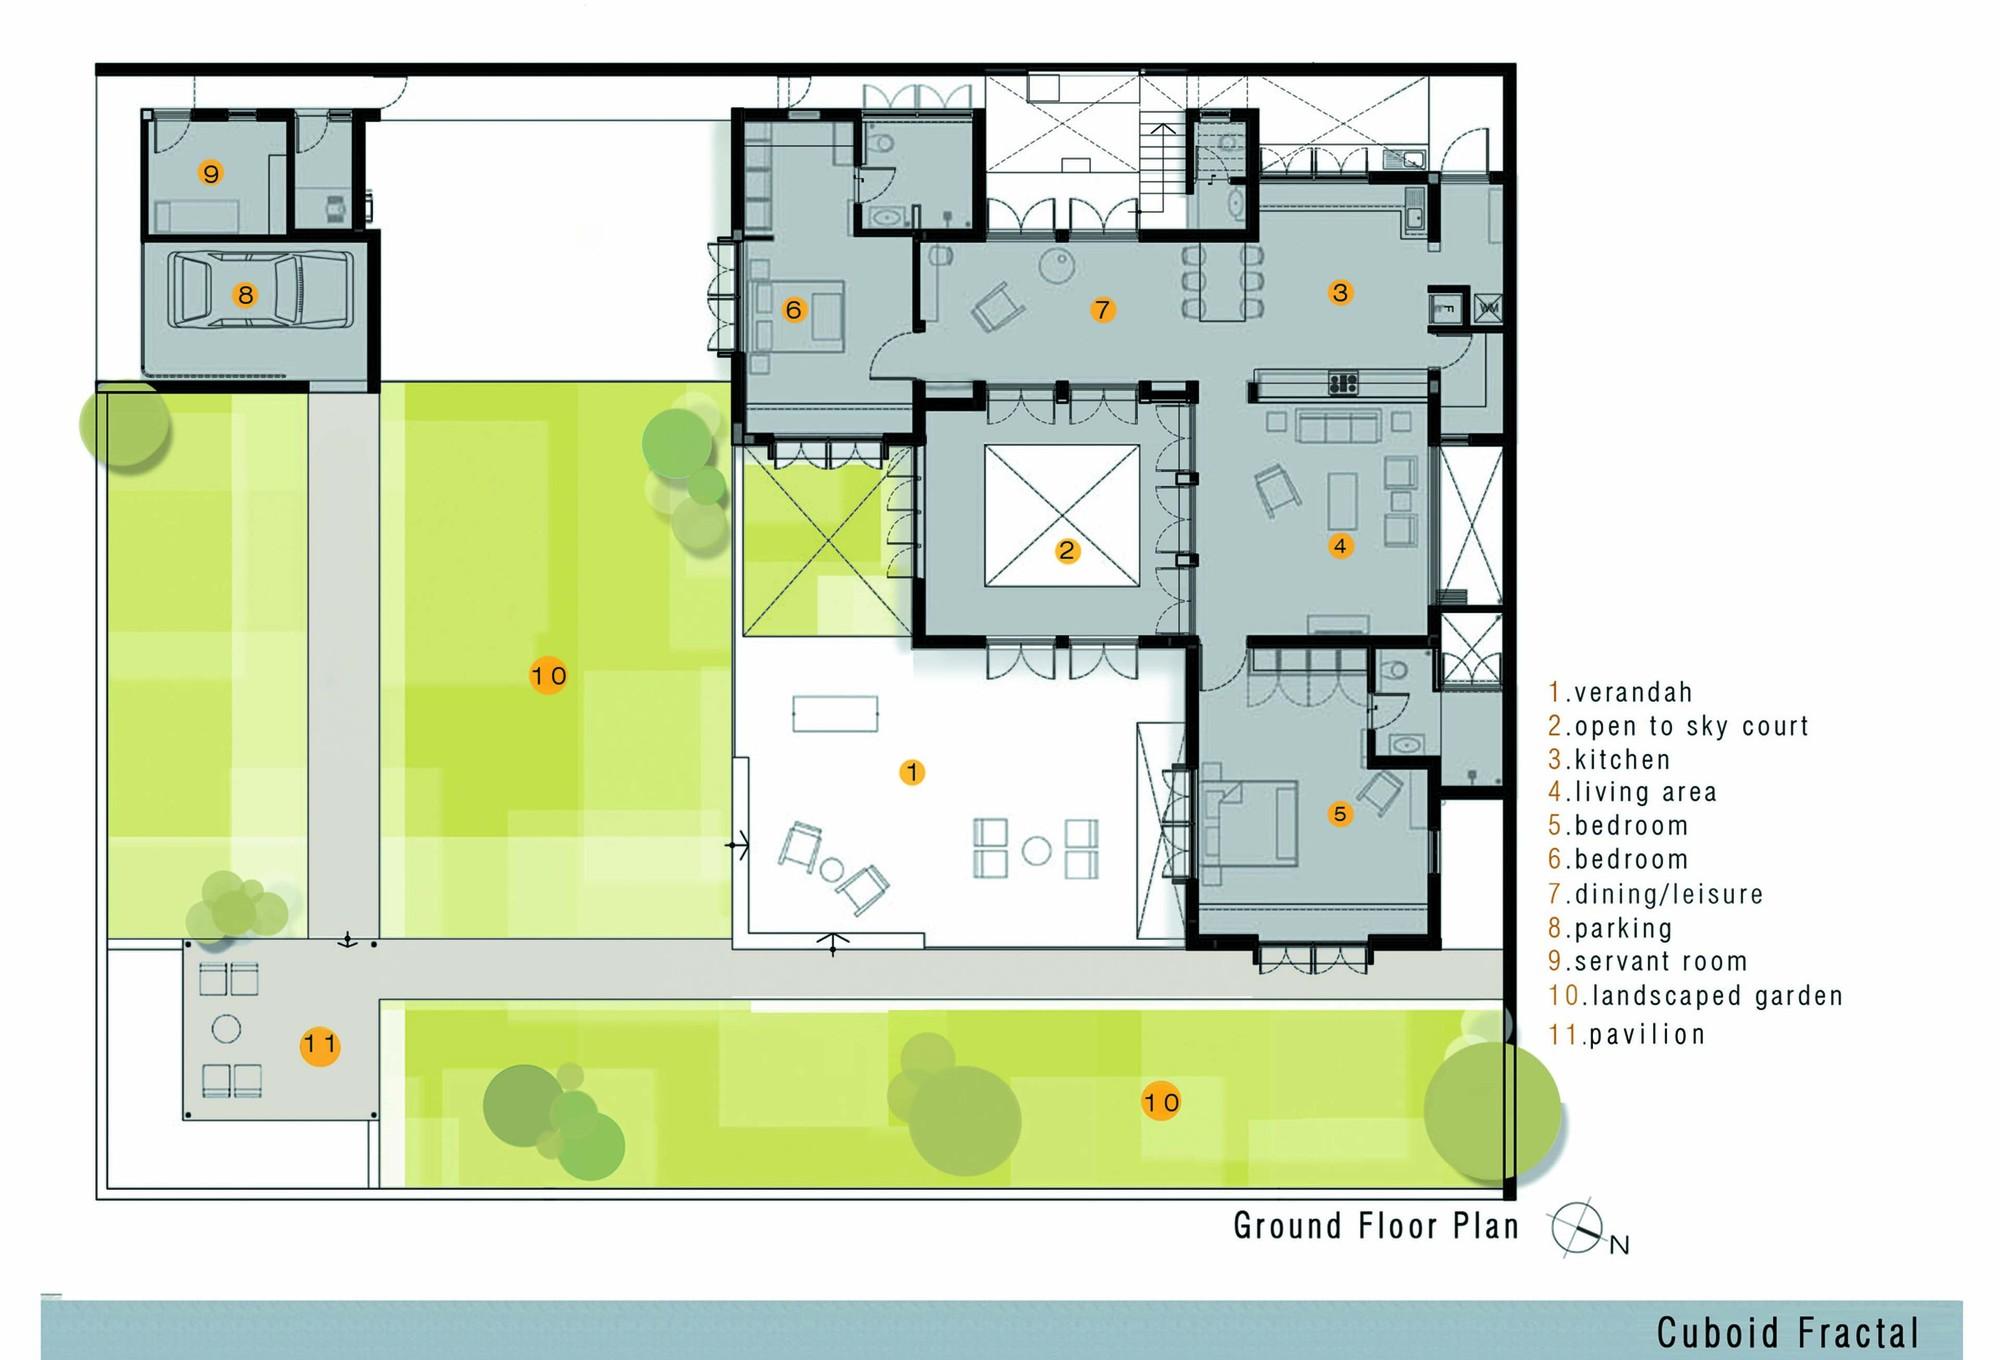 Gallery Of Cuboid Fractal Greyscale Design Studio 10